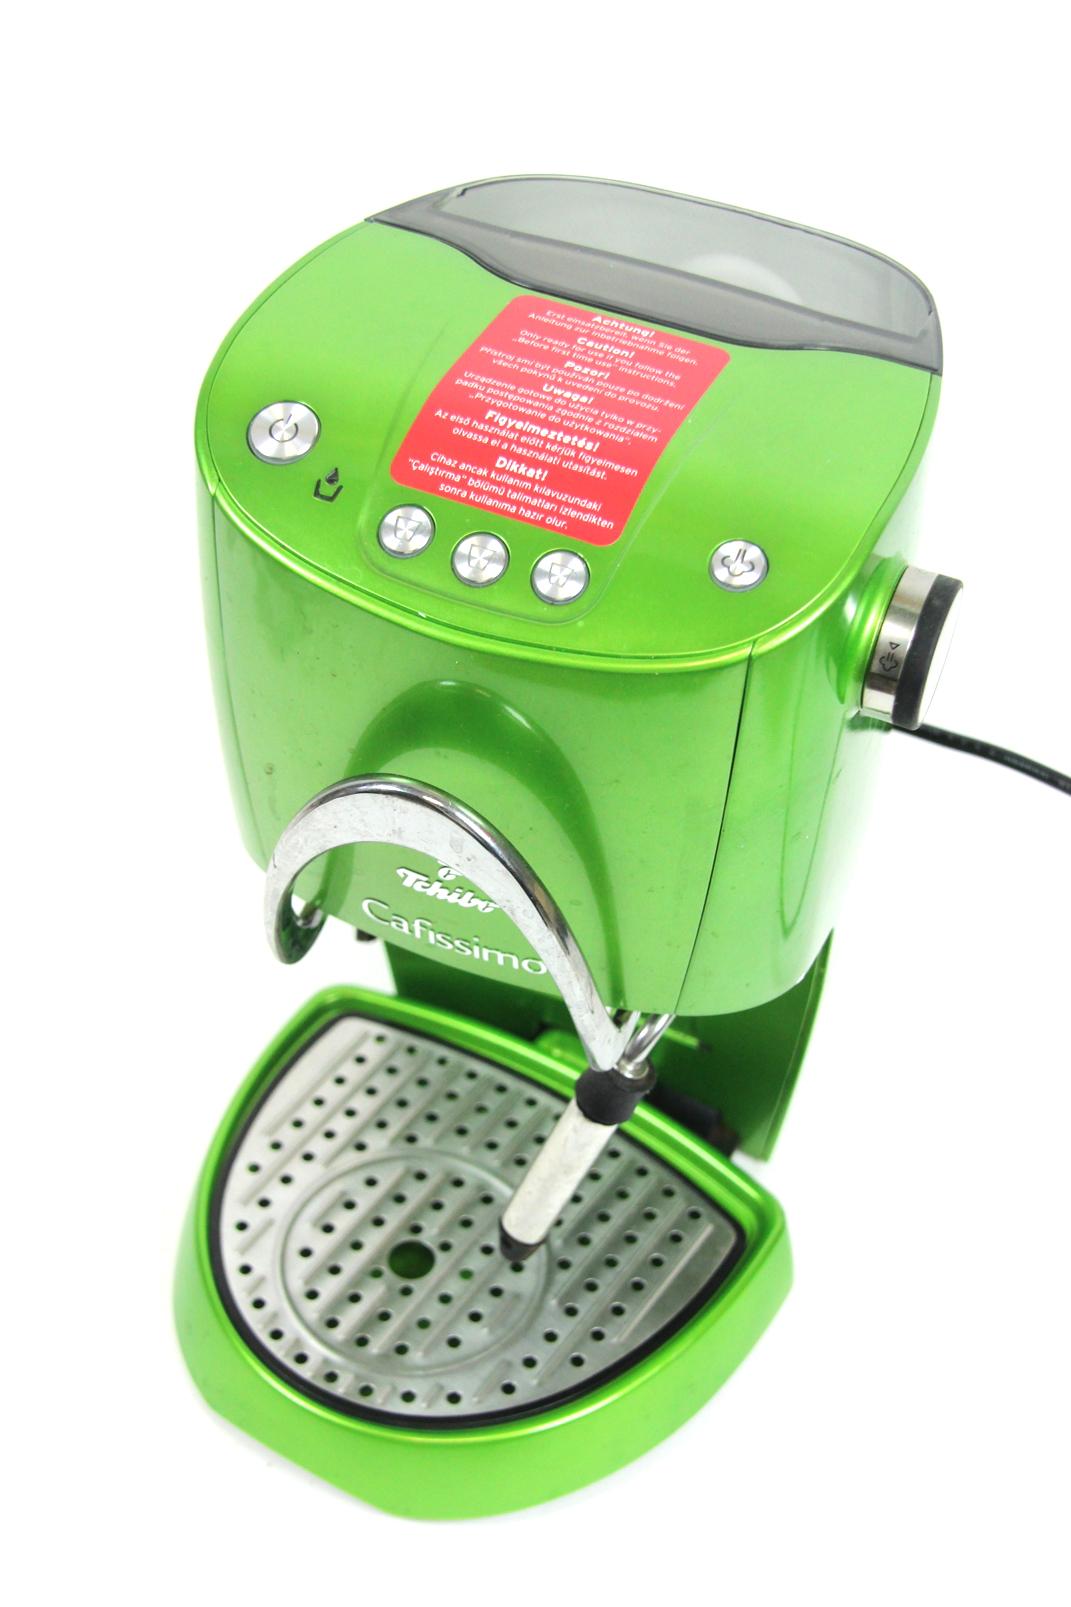 tchibo cafissimo 241565 kaffeemaschine kapselmaschine kaffee automat gr n in ovp ebay. Black Bedroom Furniture Sets. Home Design Ideas